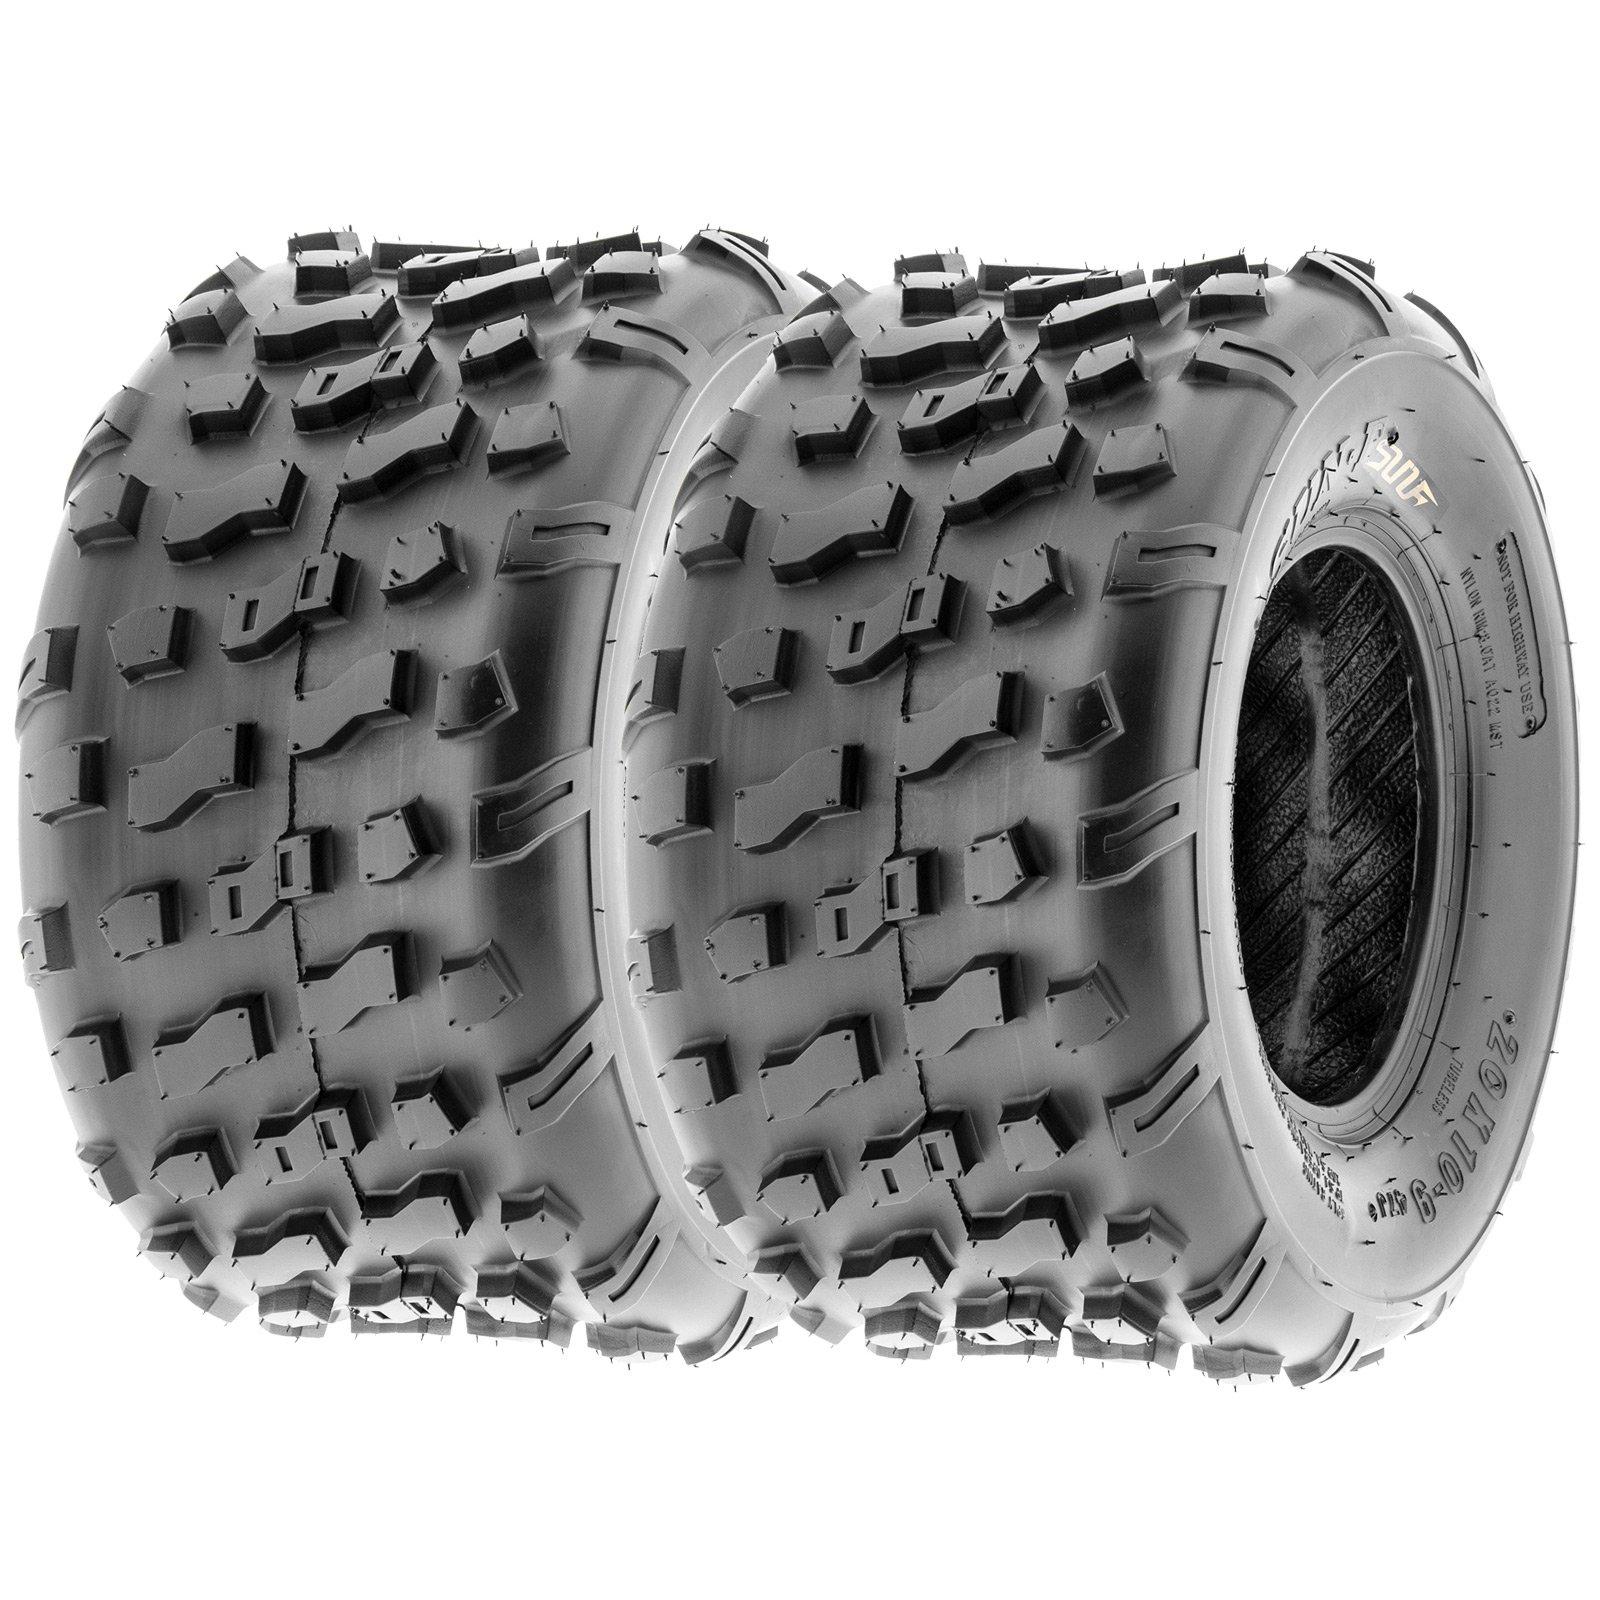 SunF Rear ATV Knobby Tires 20x10-9 20x10x9 4 PR A022 (Set pair of 2) by SunF (Image #1)